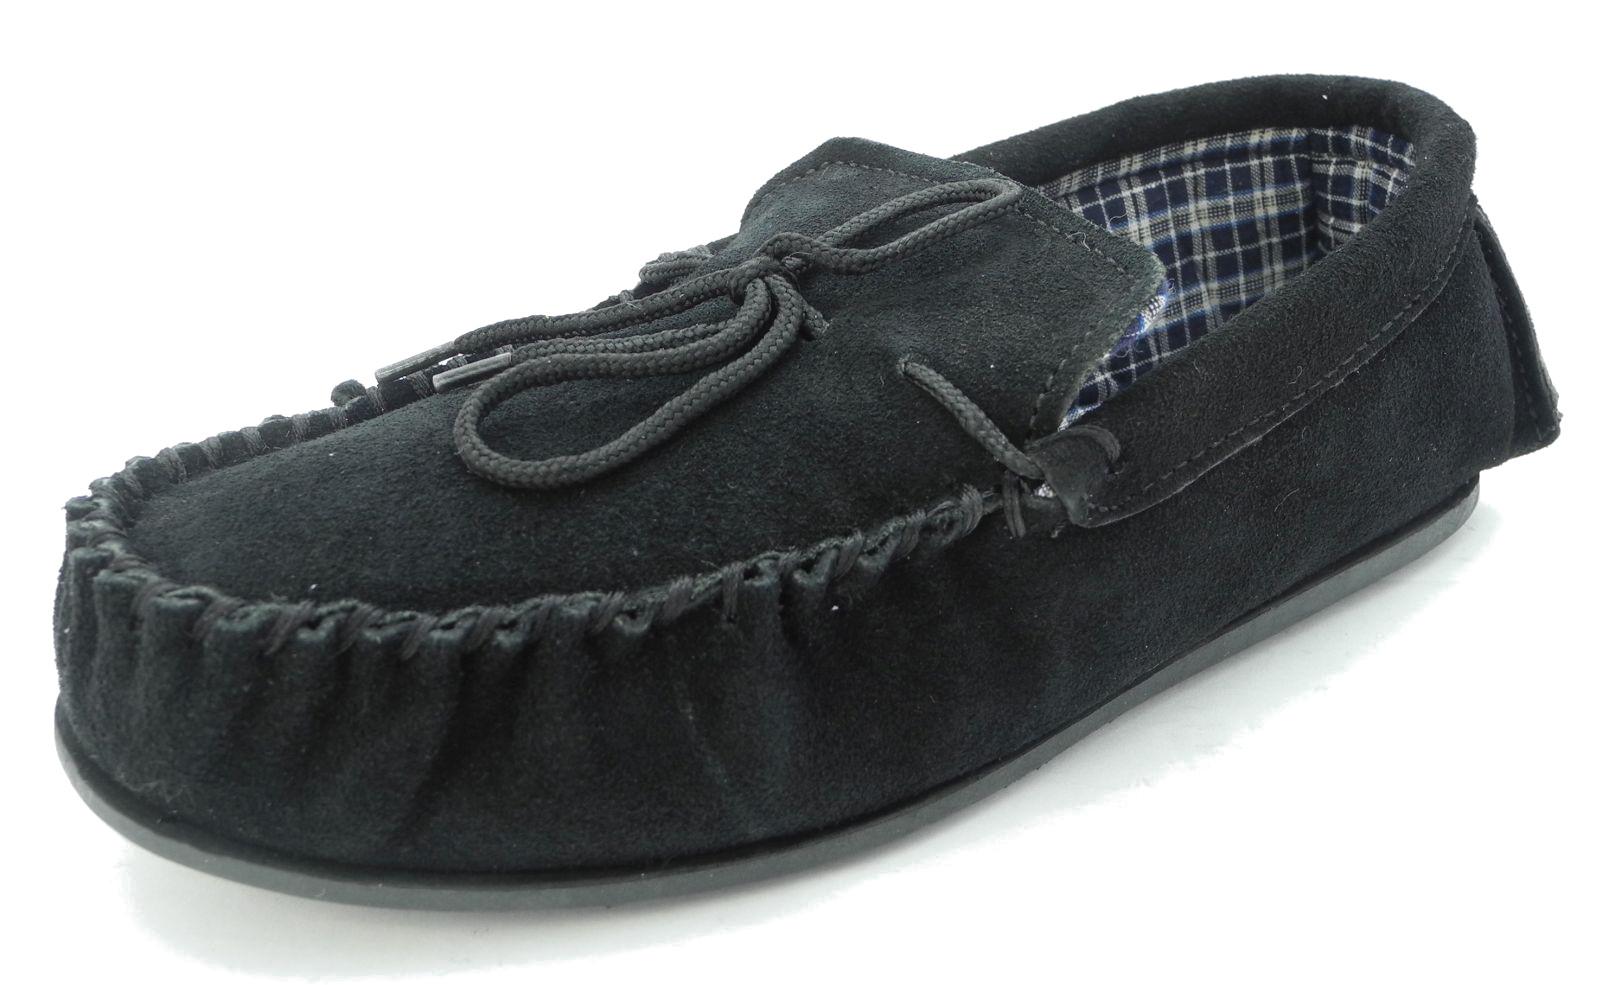 mens mokkers real suede leather moccasin slippers brown. Black Bedroom Furniture Sets. Home Design Ideas